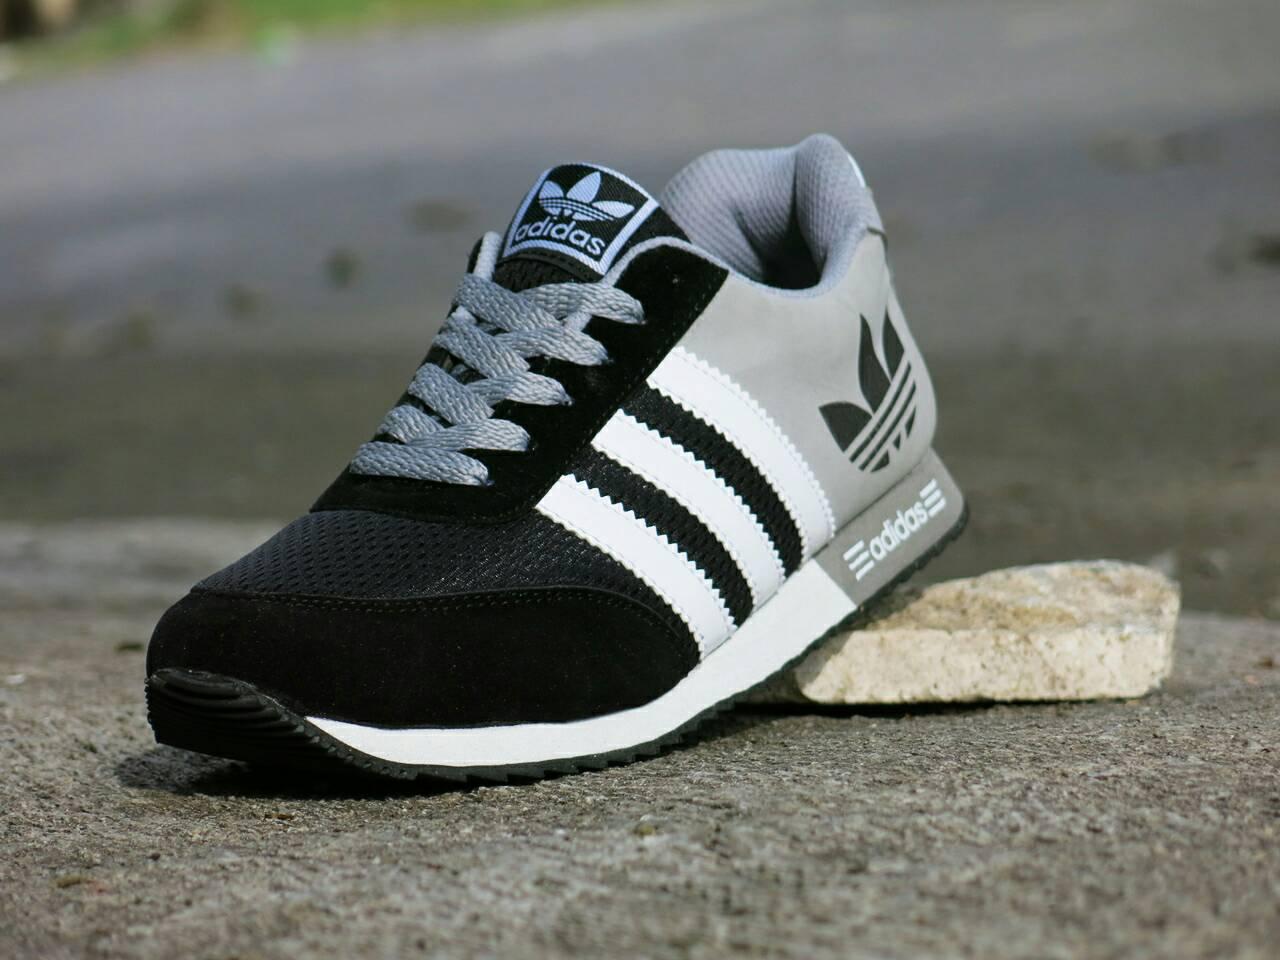 Jual Sepatu Sport Adidas V Racer Classic Hitam Abu Abu harga grosir ... 930af7313b